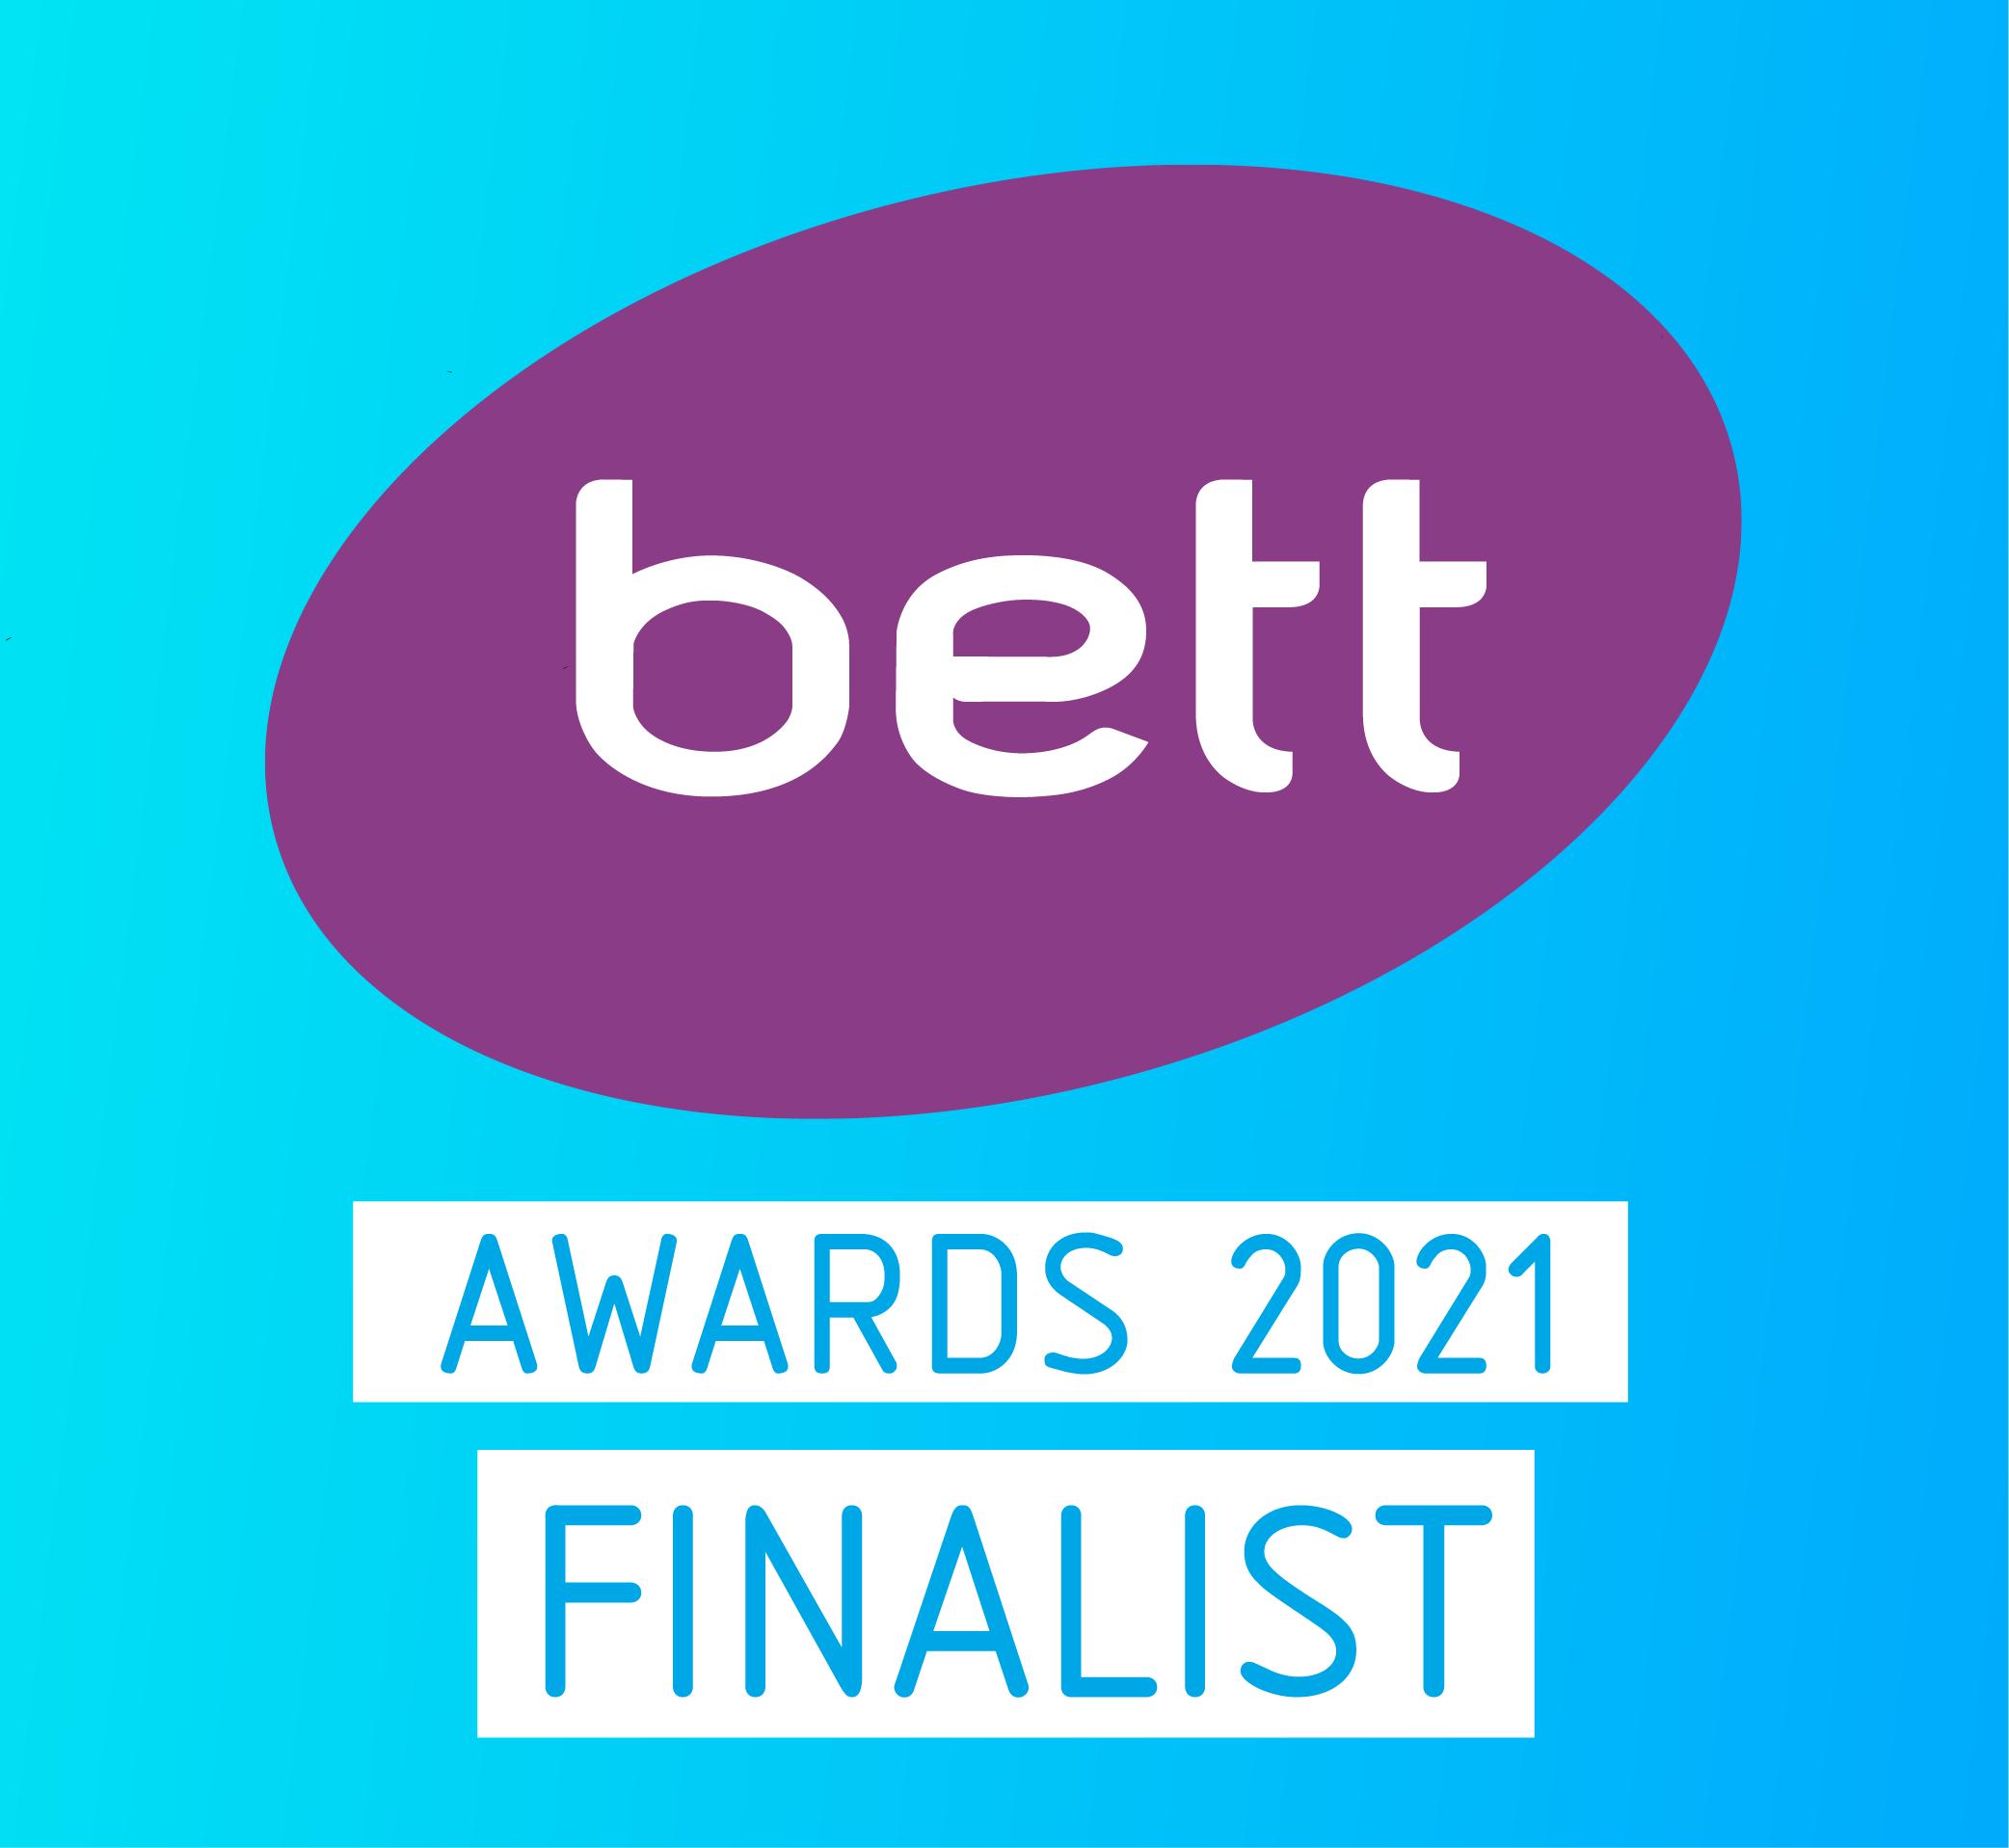 The HUE HD Pro Camera is a Bett Awards 2021 Finalist!